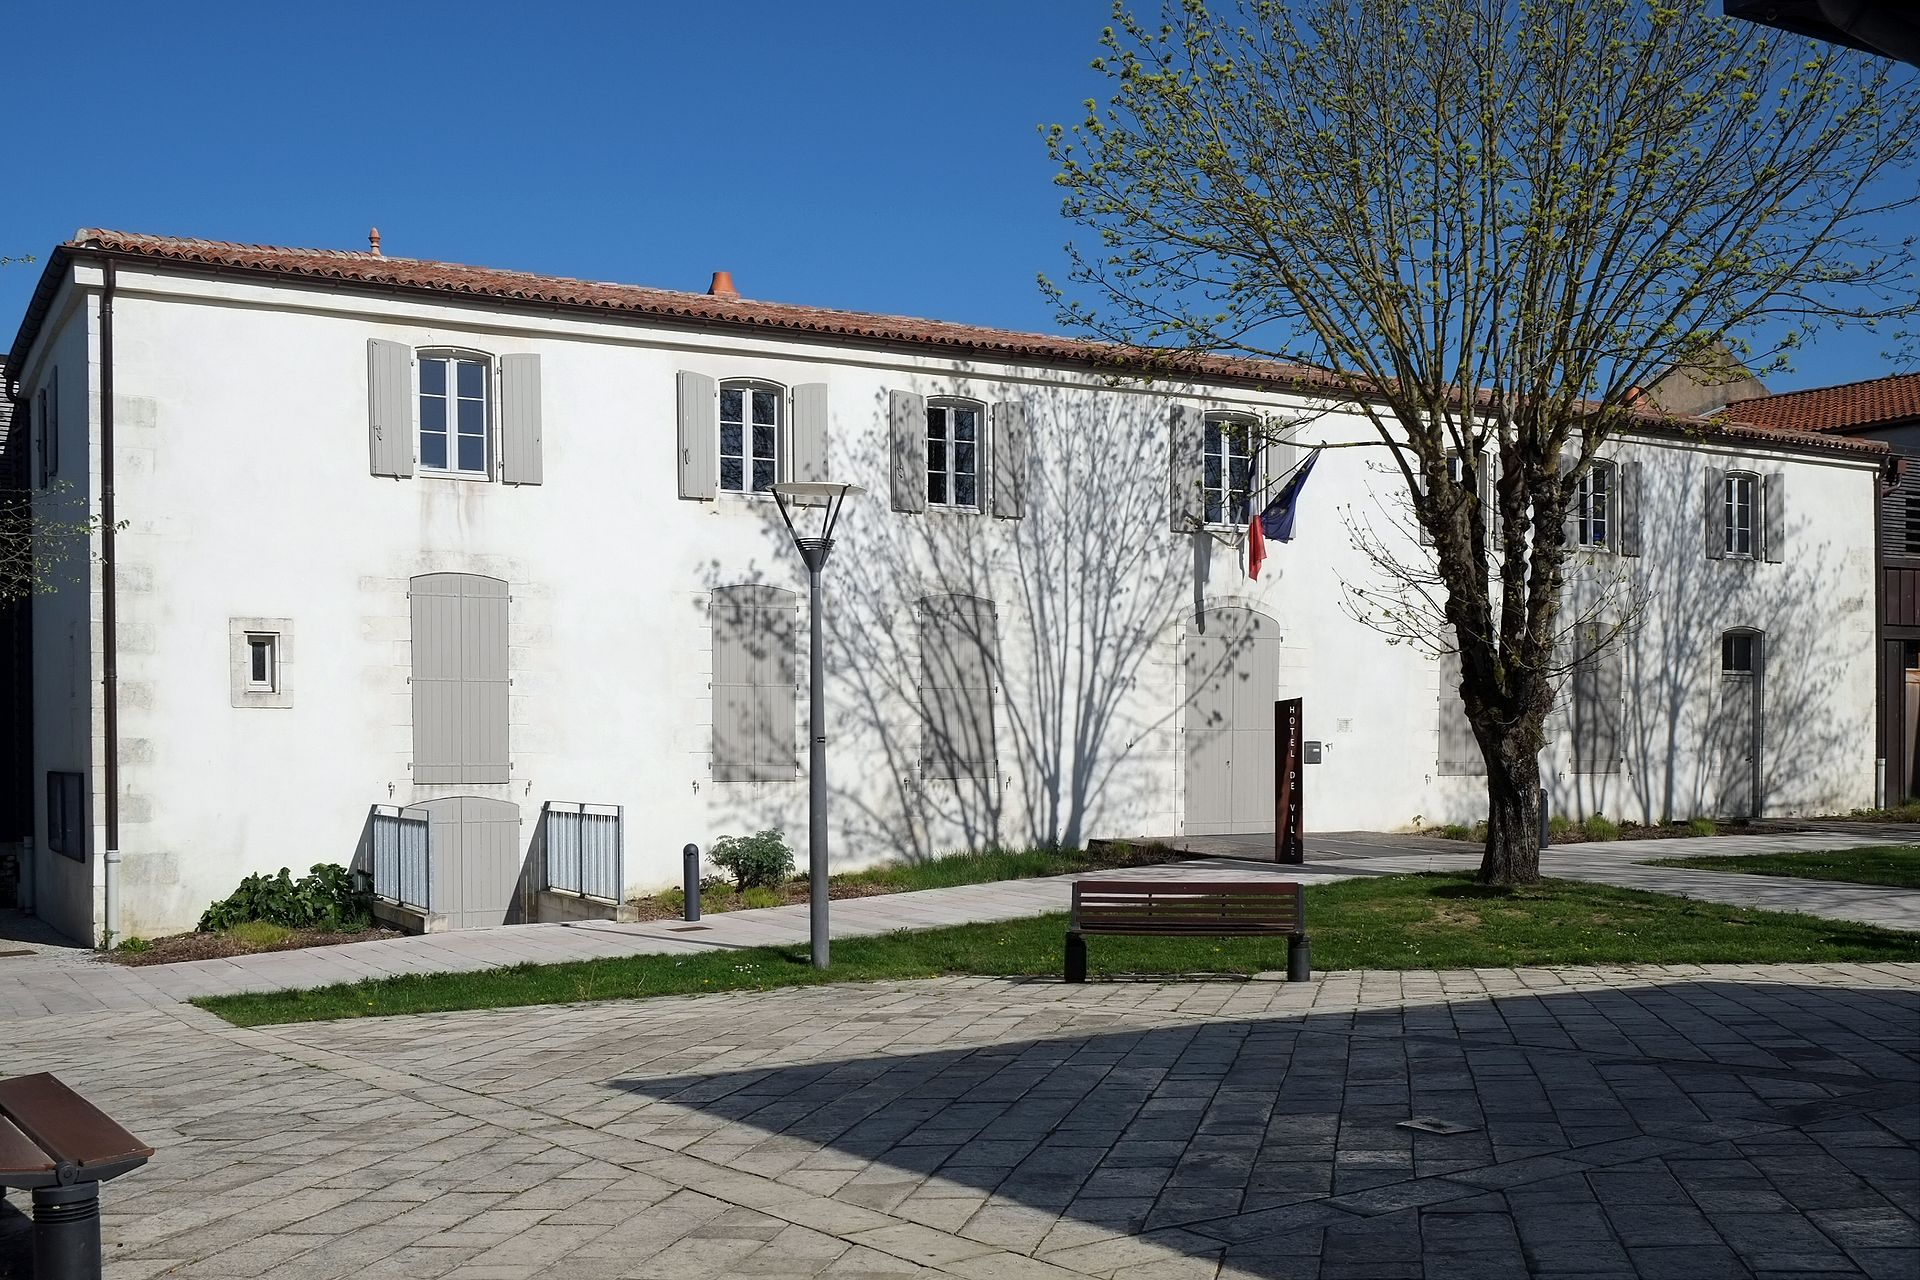 Hotel Dompierre Sur Mer